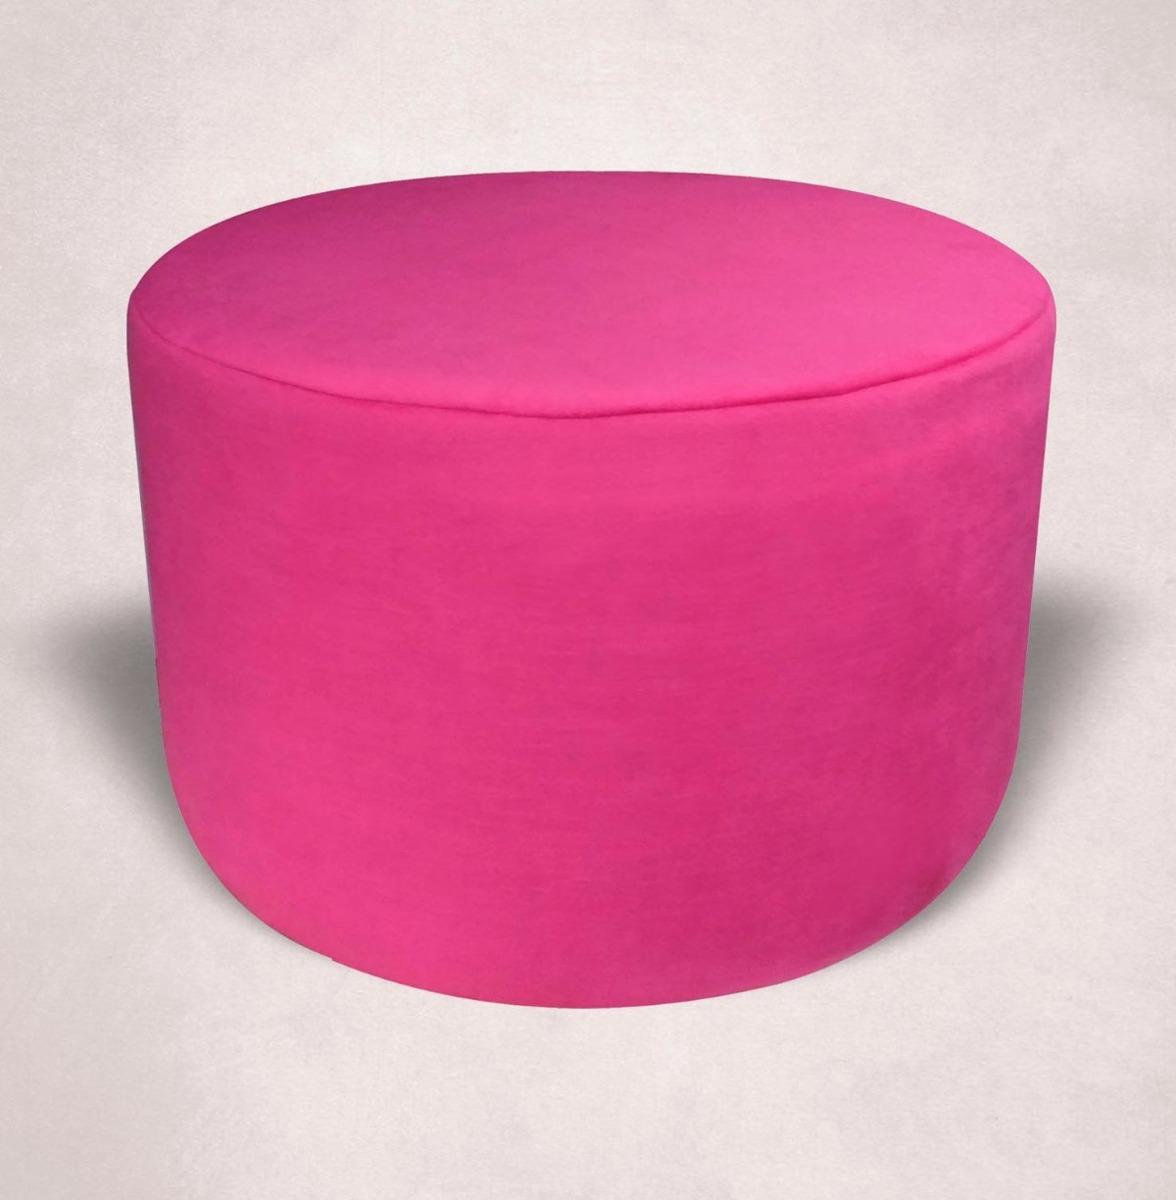 Único Muebles Otomana Pink Redondo Viñeta - Muebles Para Ideas de ...